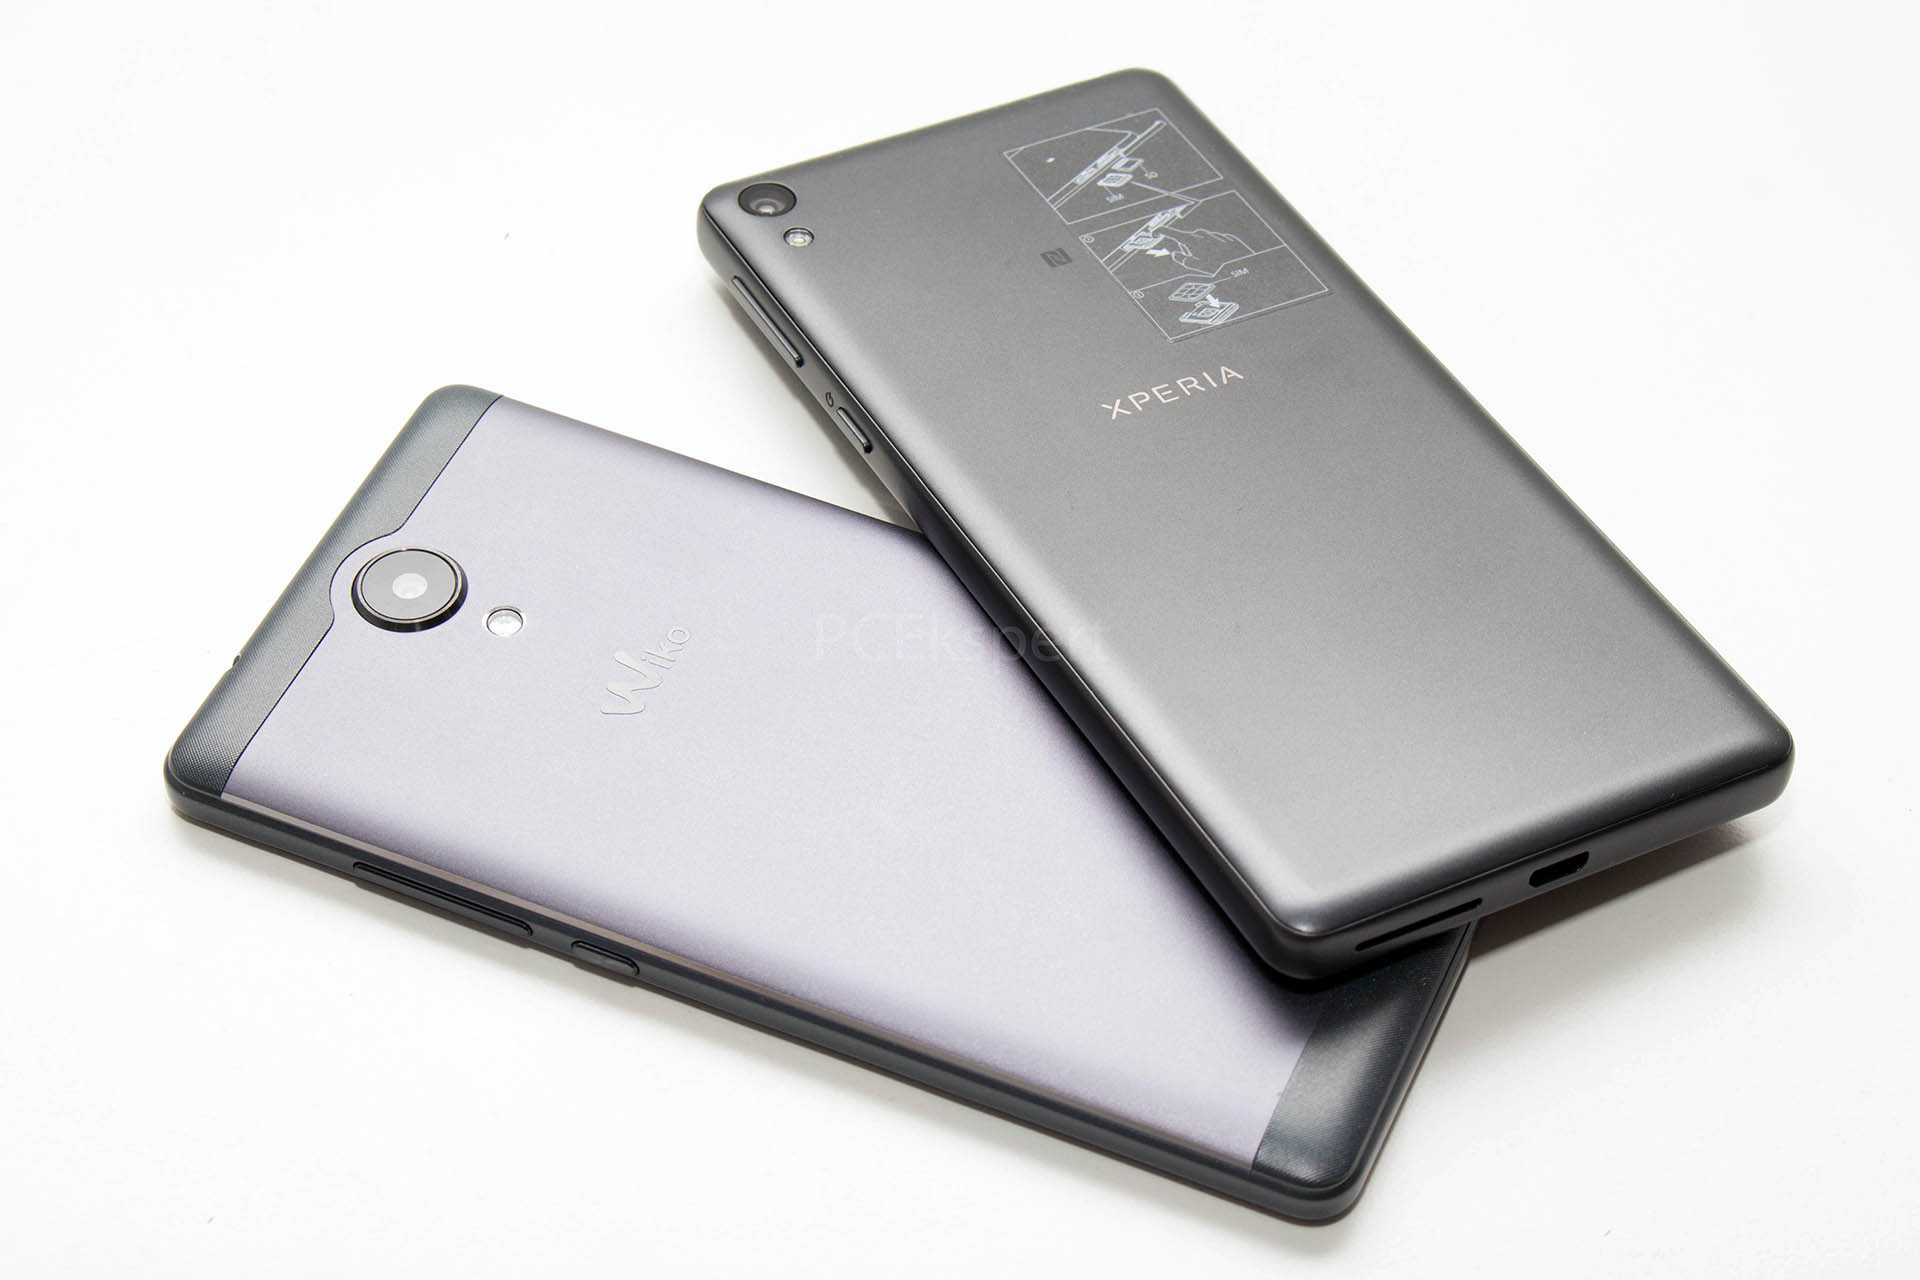 Usporedni test – Sony Xperia E5 vs. Wiko U Feel Lite